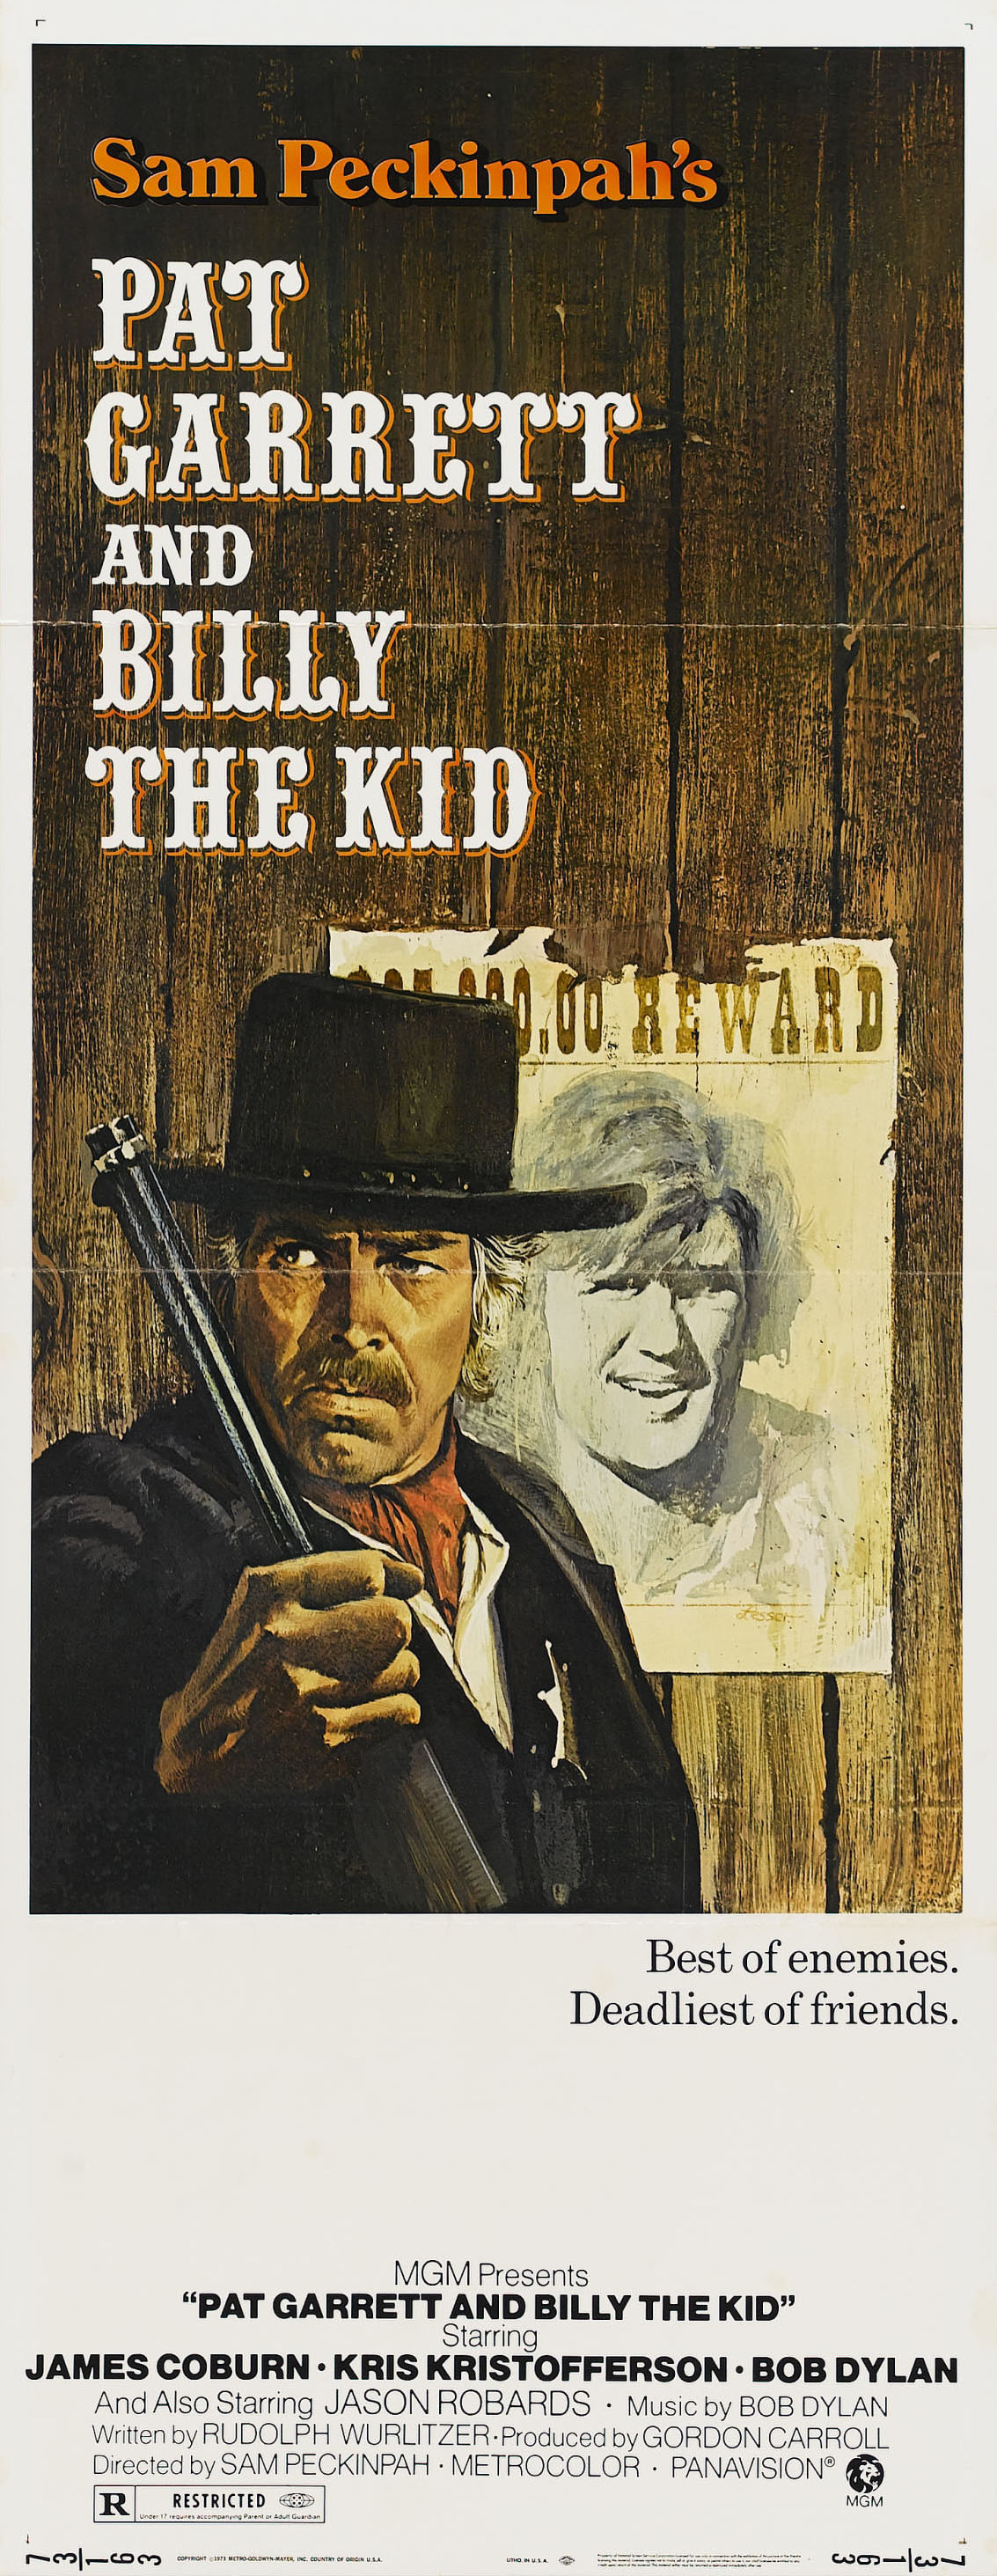 pat garrett et billy le kid 1973